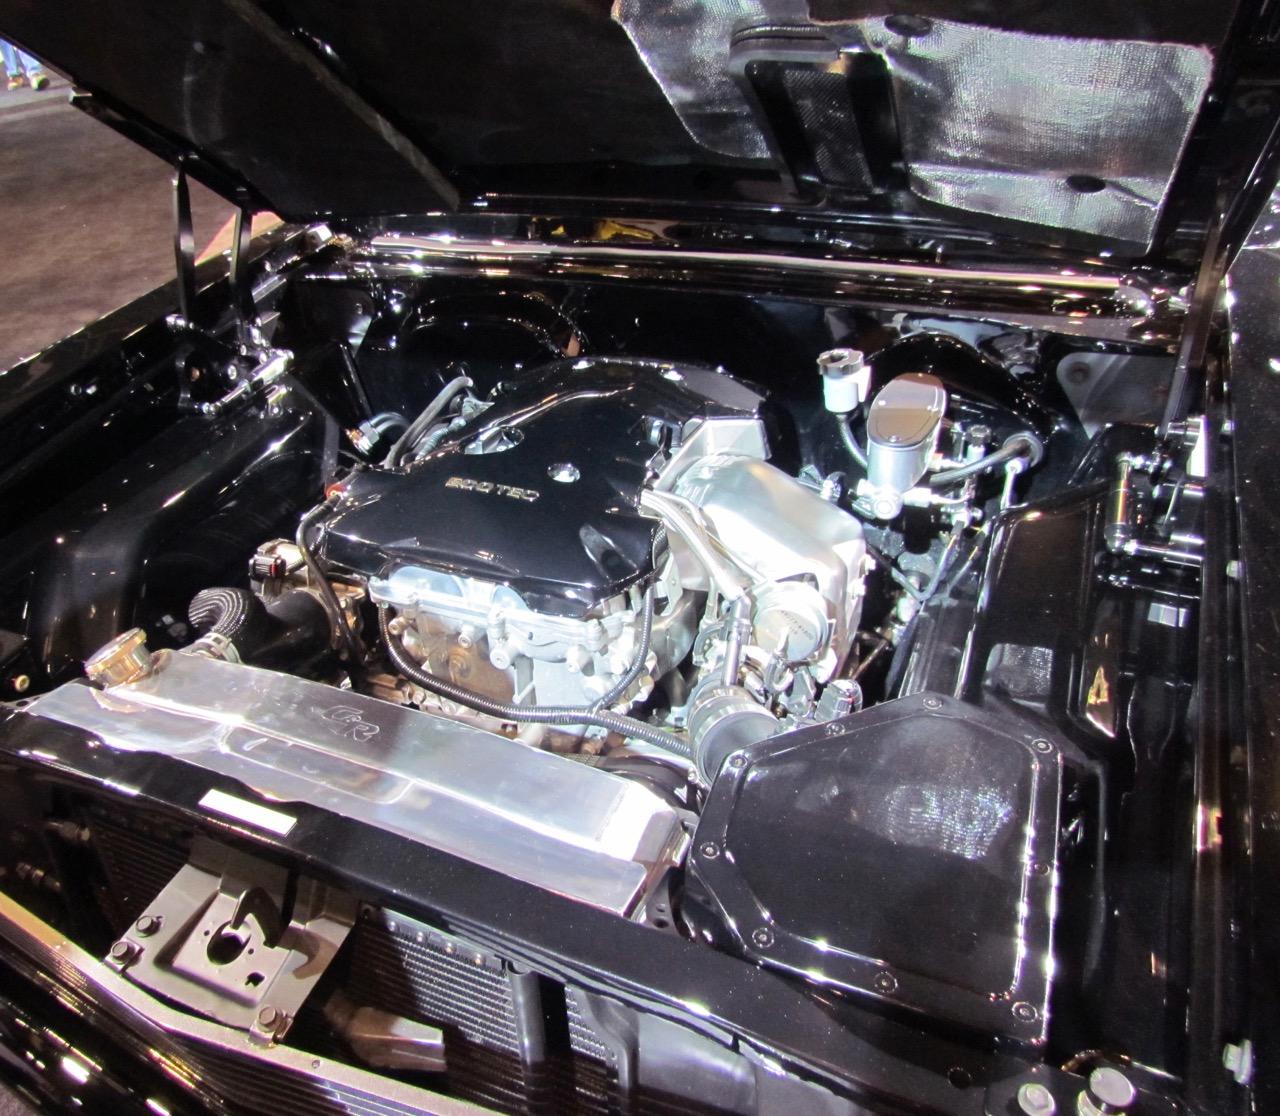 The turbo four fits easily into Nova engine bay